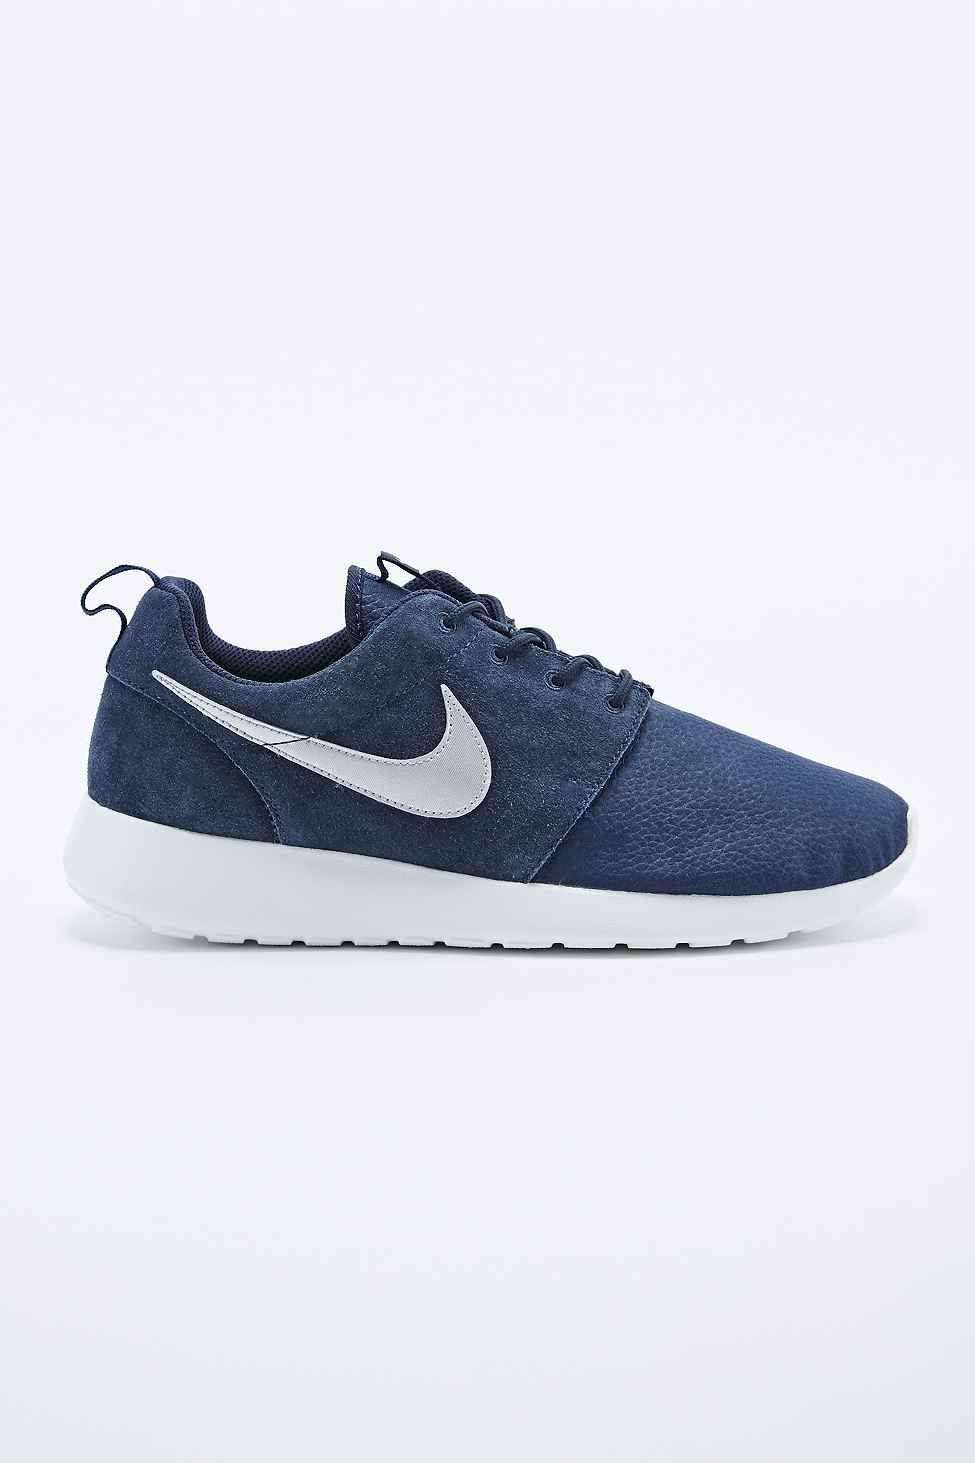 a8ba46e5e67e Nike Roshe Run Suede Trainers in Obsidian Blue